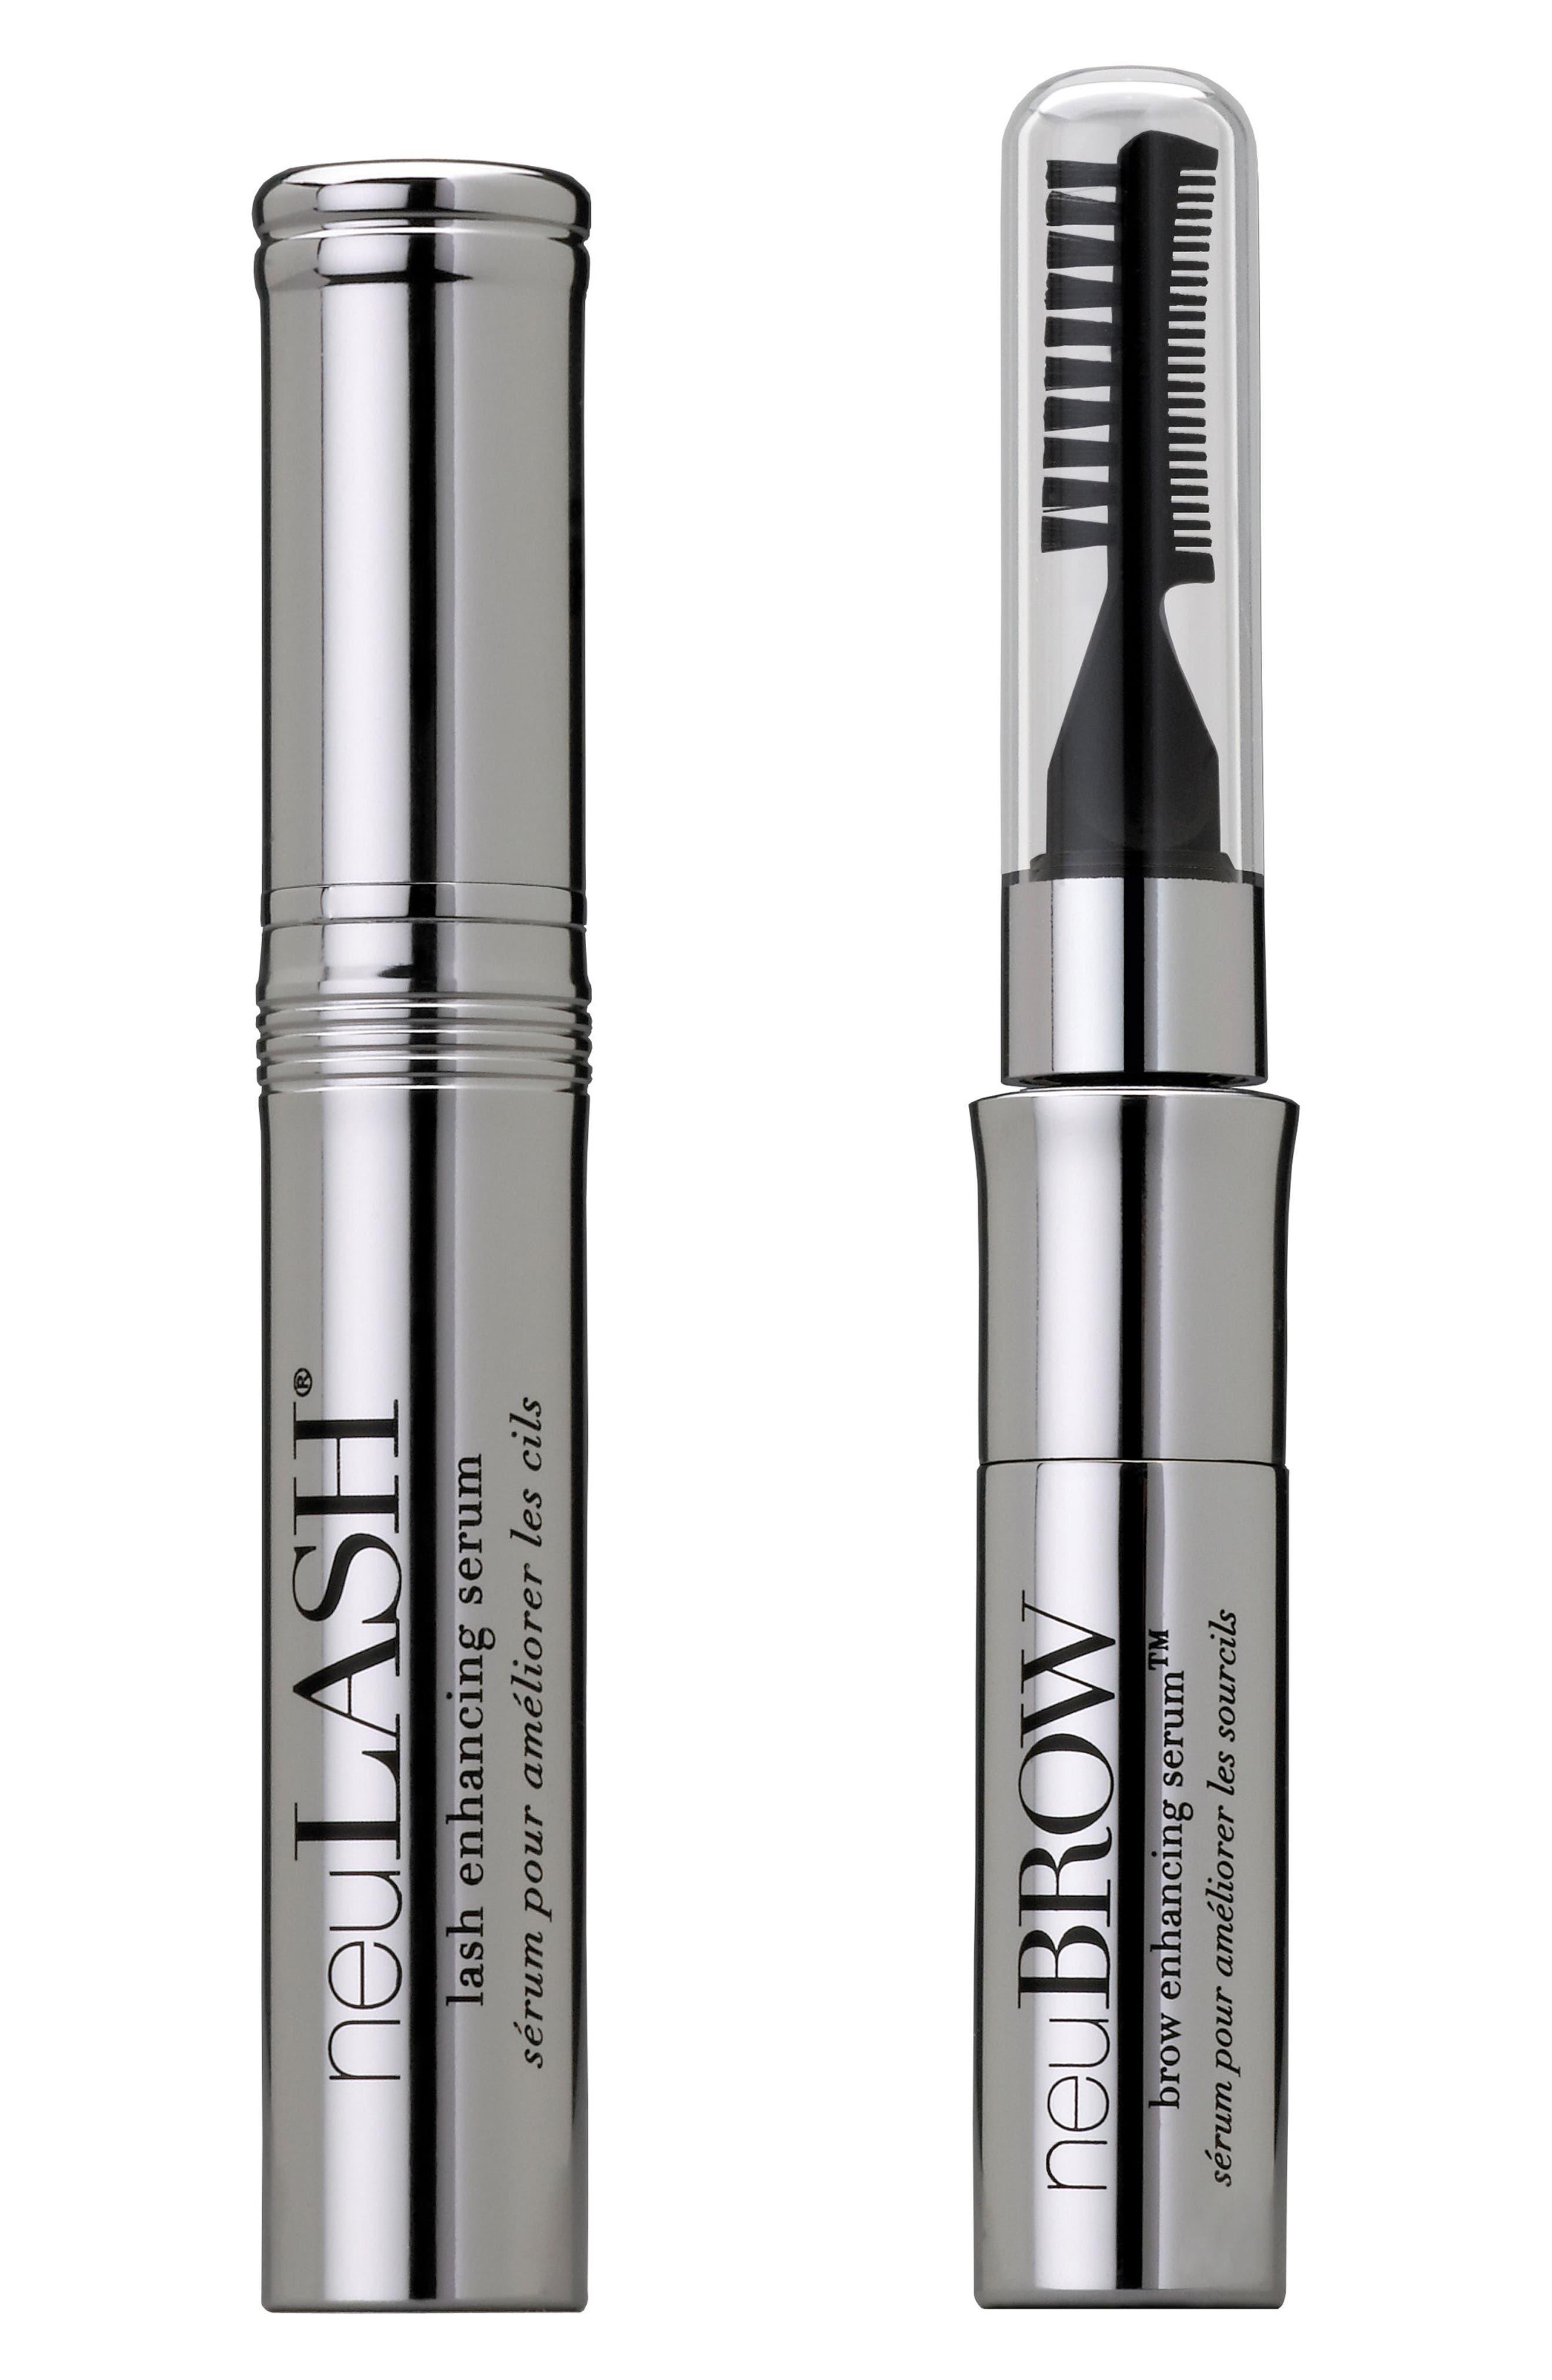 Alternate Image 1 Selected - neuLASH® Lash & Brow Enhancing Serum Duo ($250 Value)